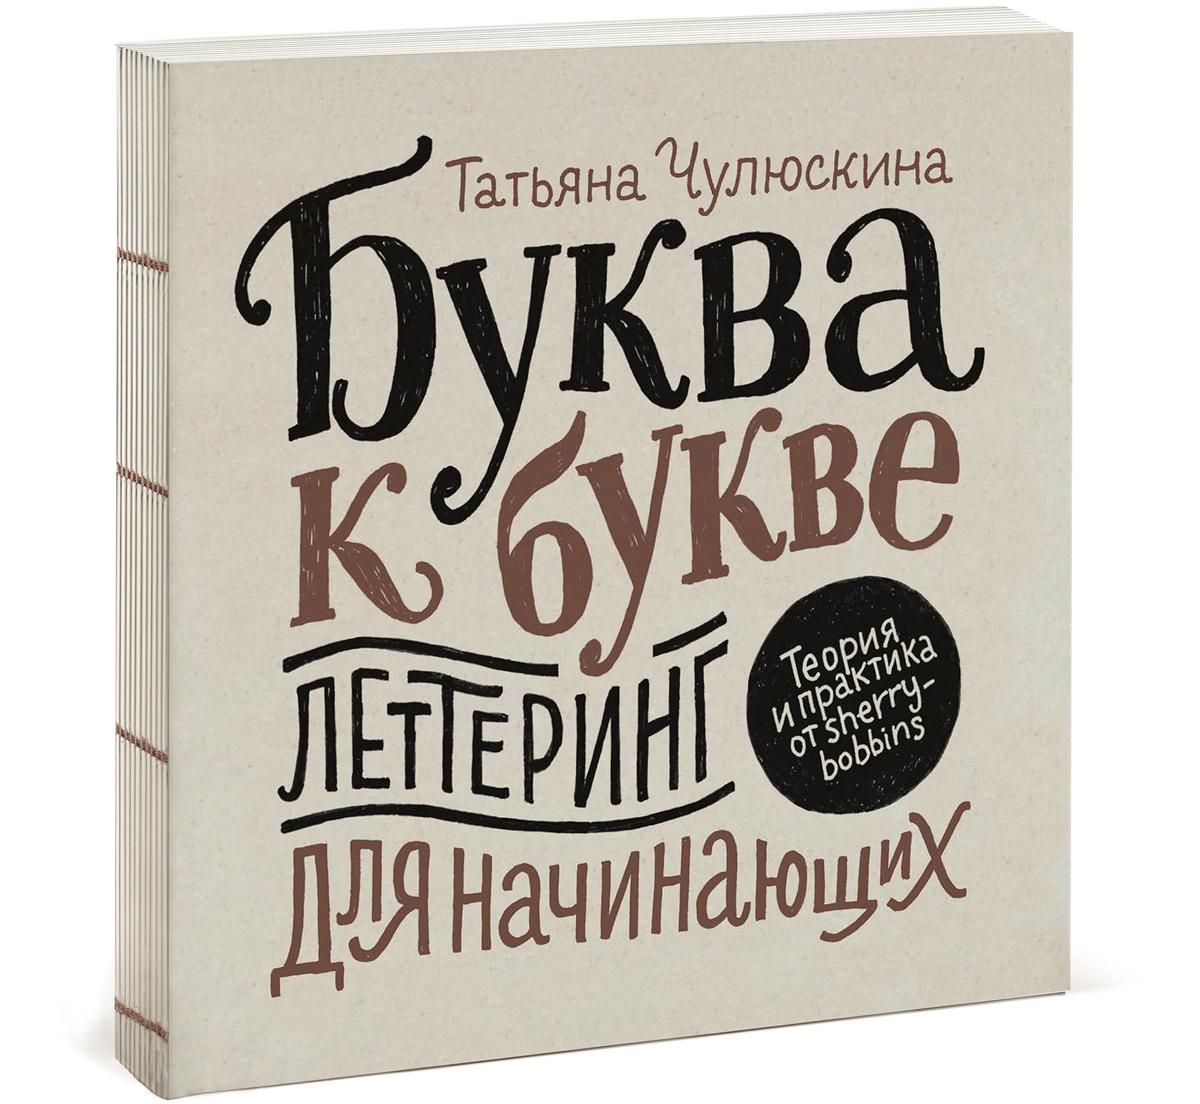 Татьяна Чулюскина Буква к букве. Леттеринг для начинающих